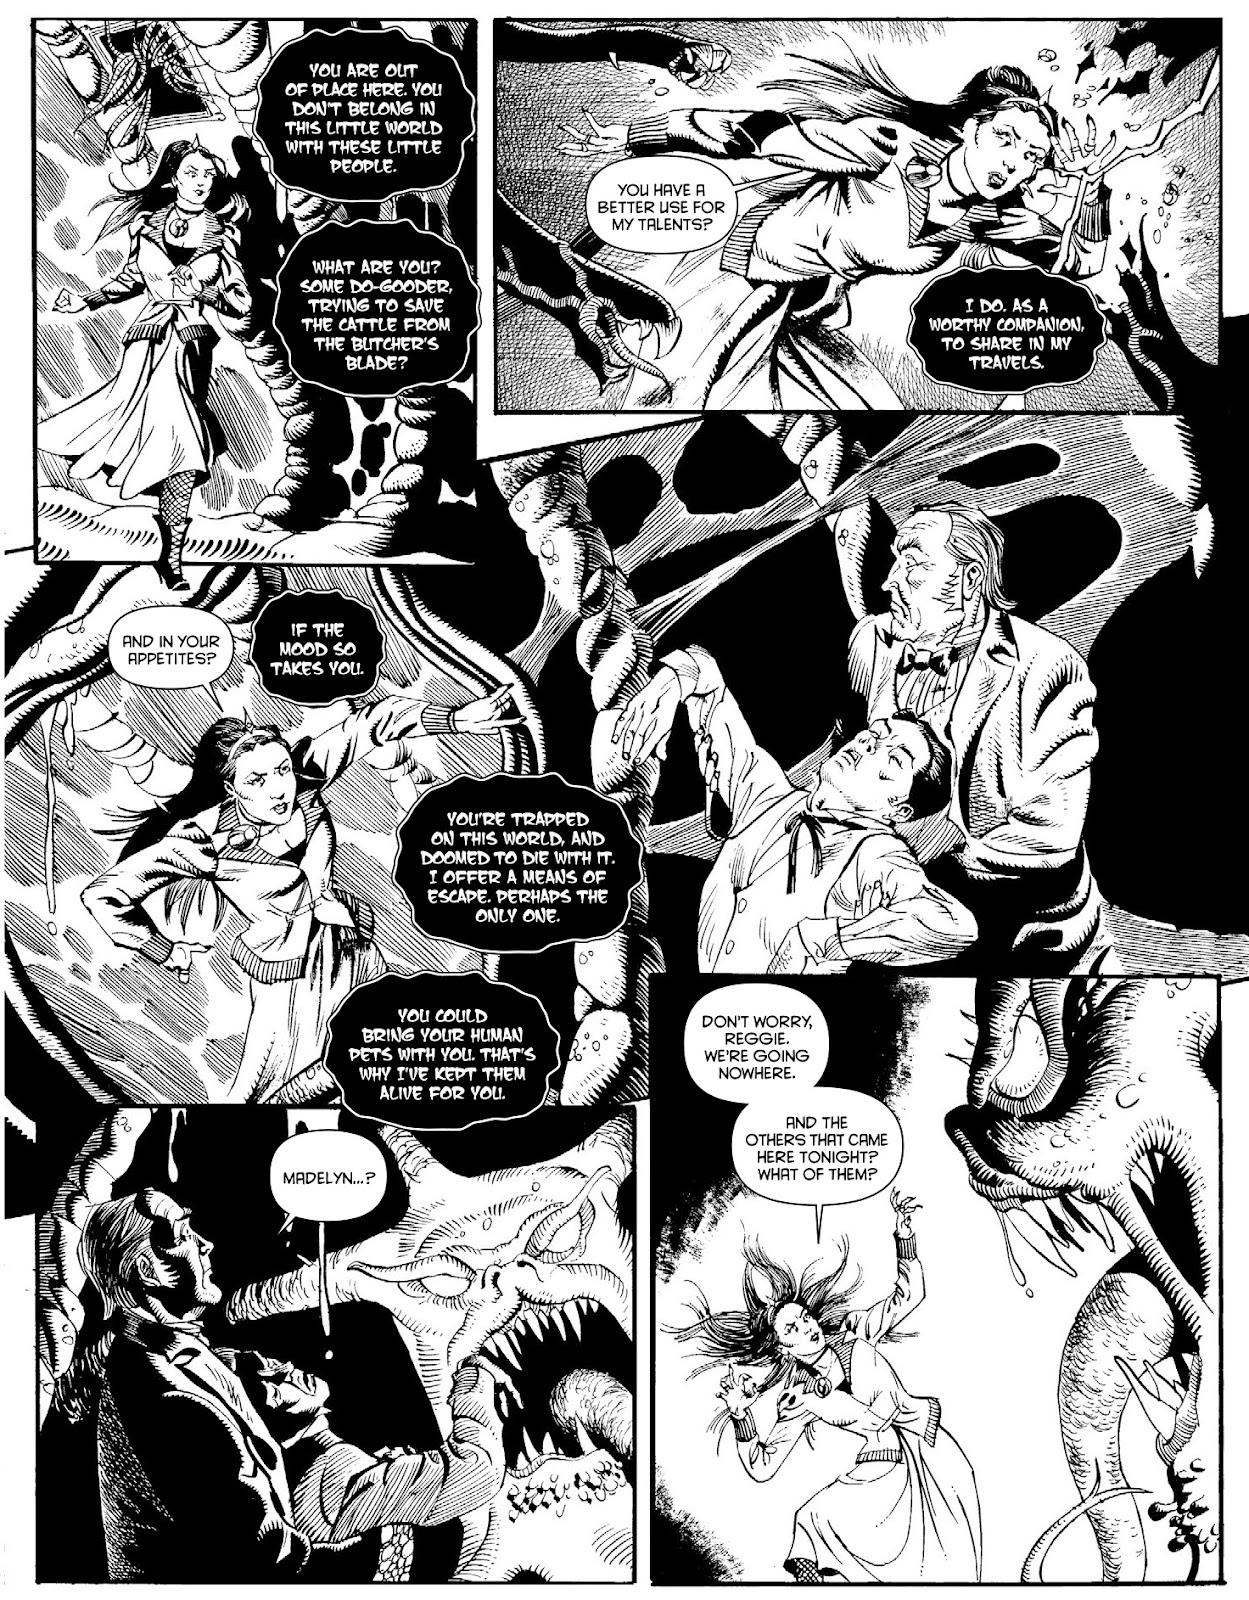 Judge Dredd Megazine (Vol. 5) issue 427 - Page 106